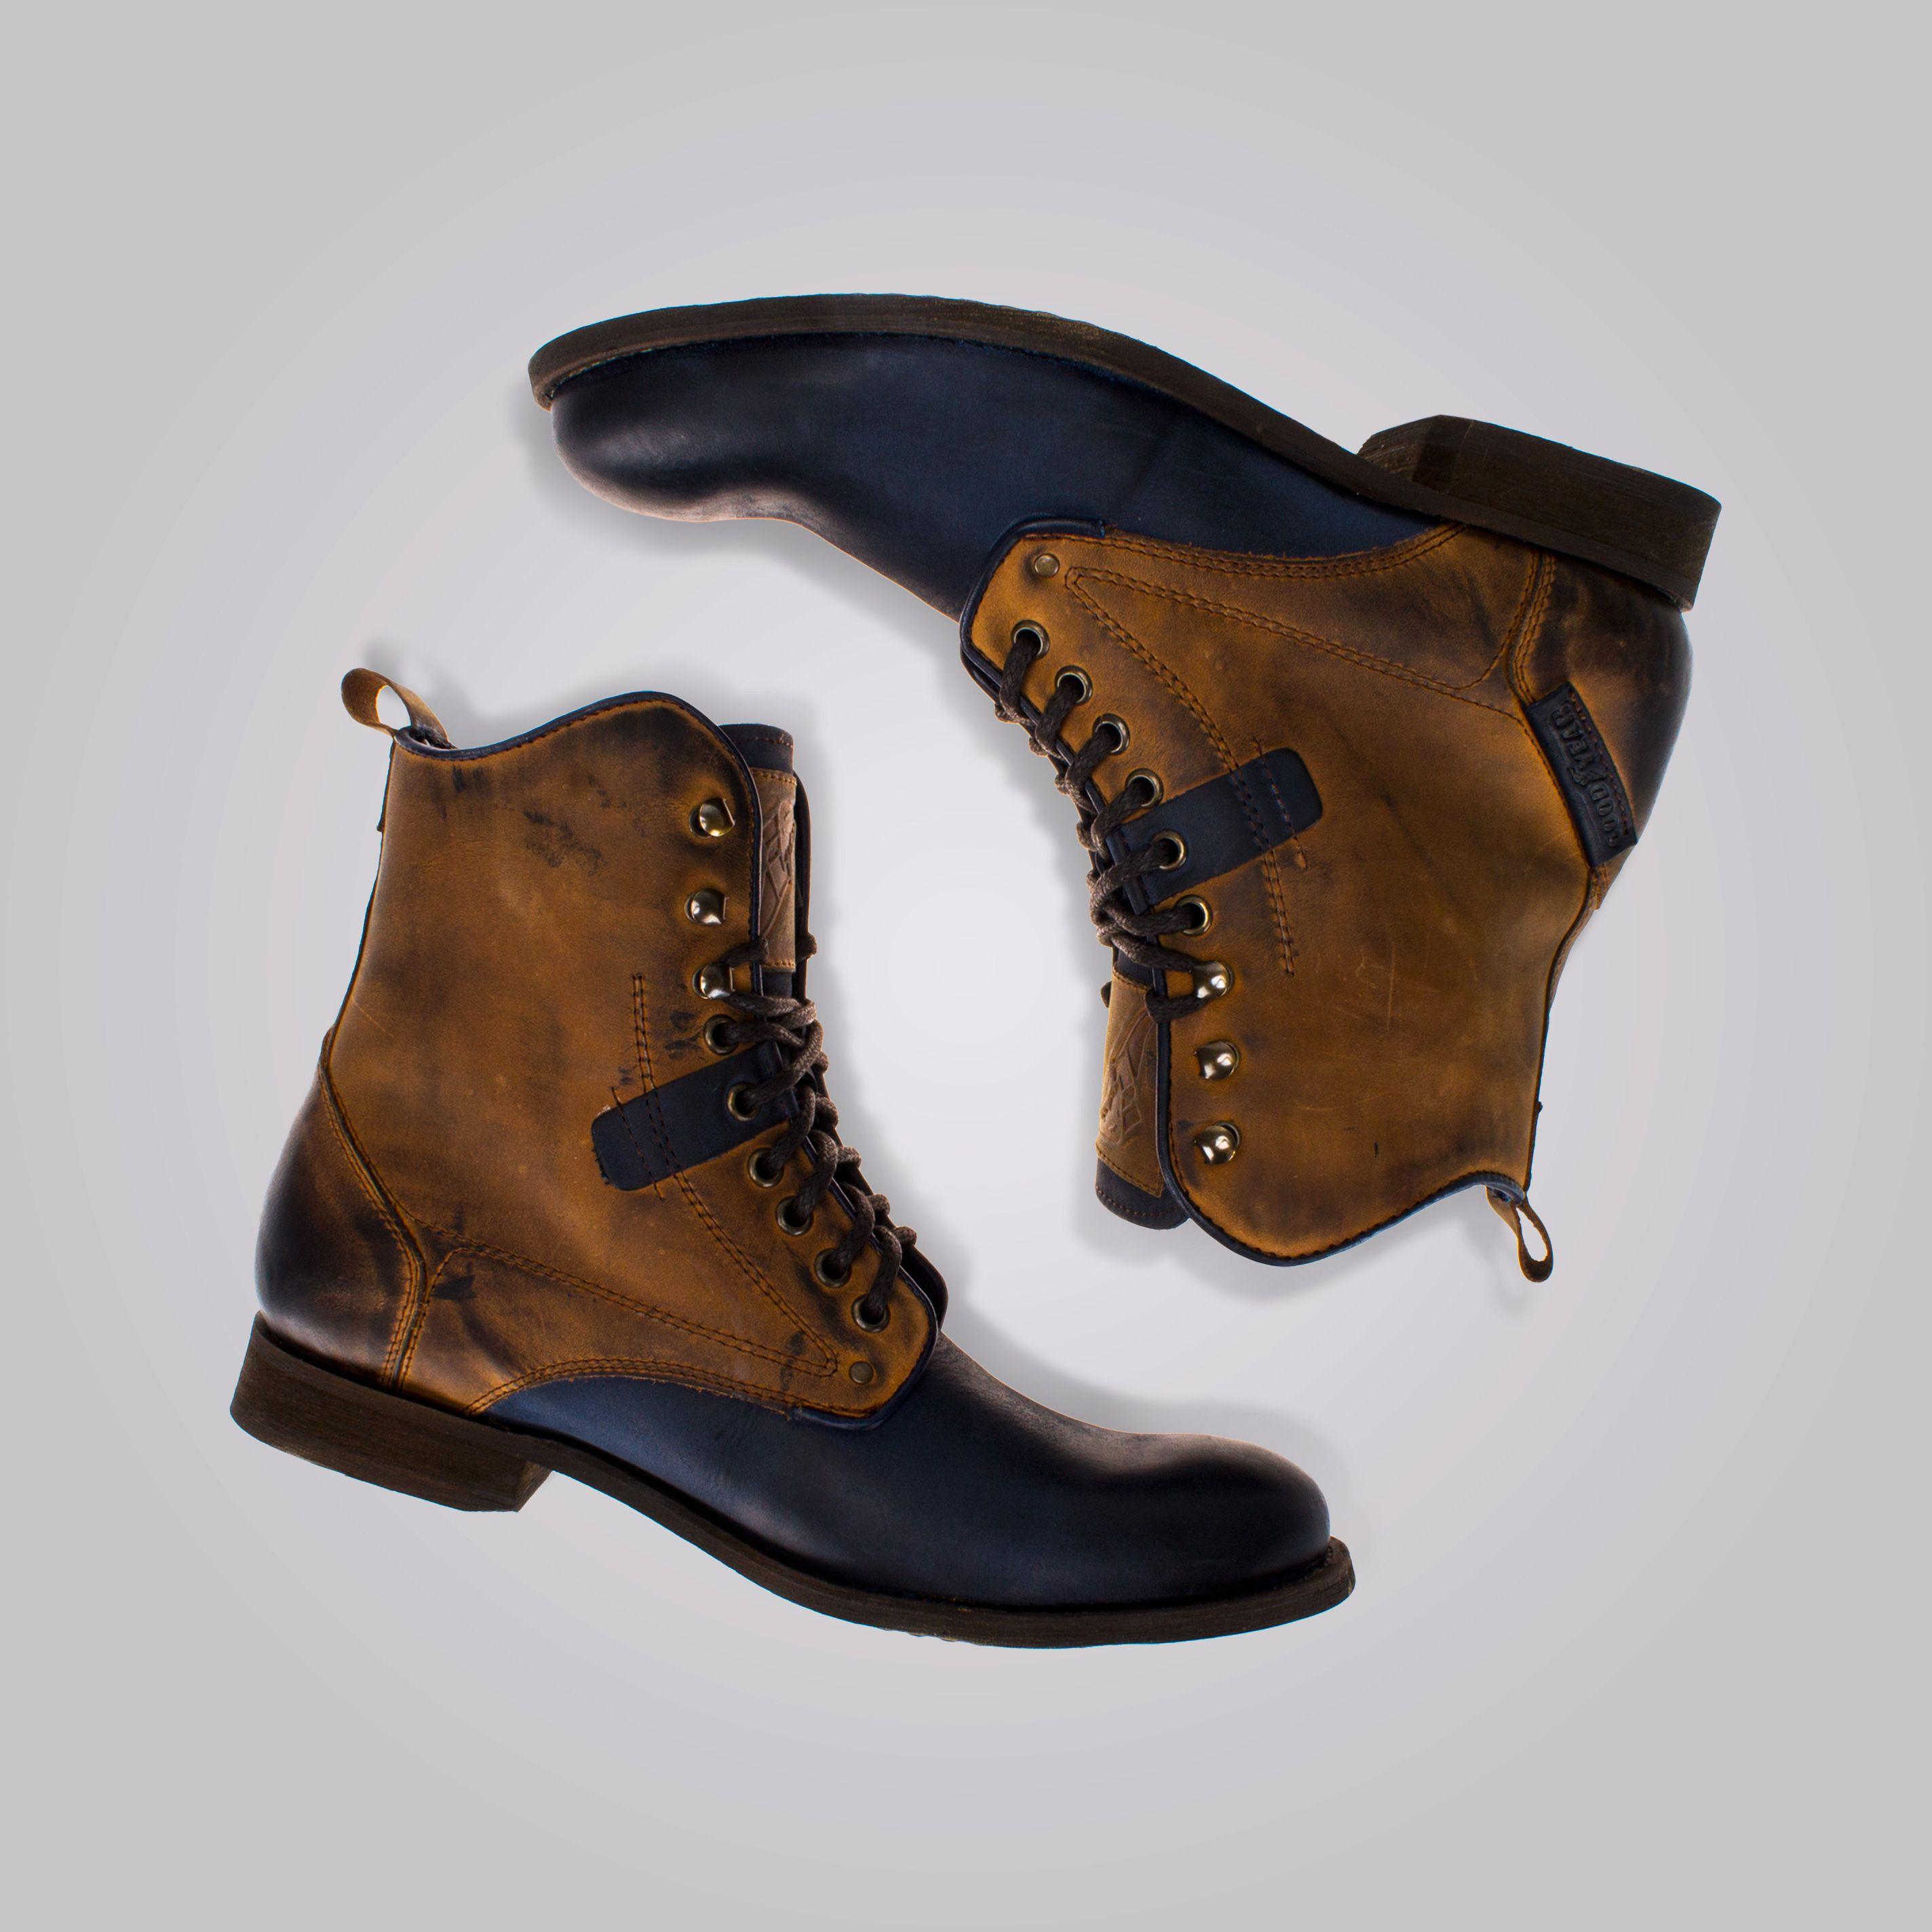 Tu estilo, tus botas #priceshoes #lamodamasdeseada #botas #caballeros.  ¡Adquiérelas